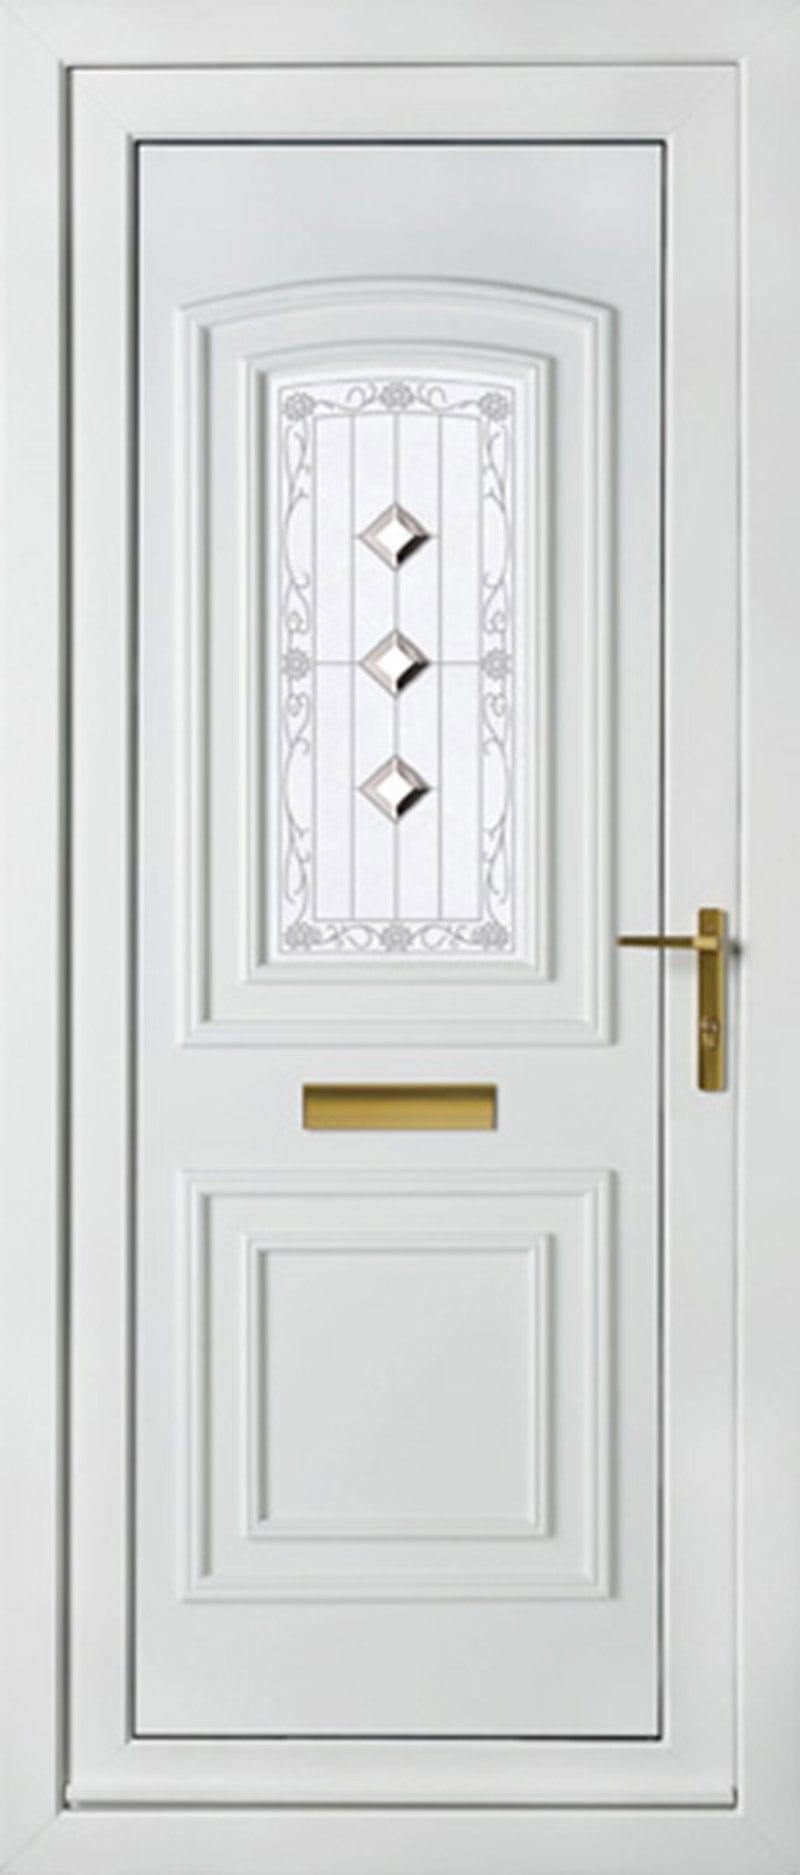 Pvc Windows And Doors Lebanon : Pvc doors and decorative panels dorset windows ltd